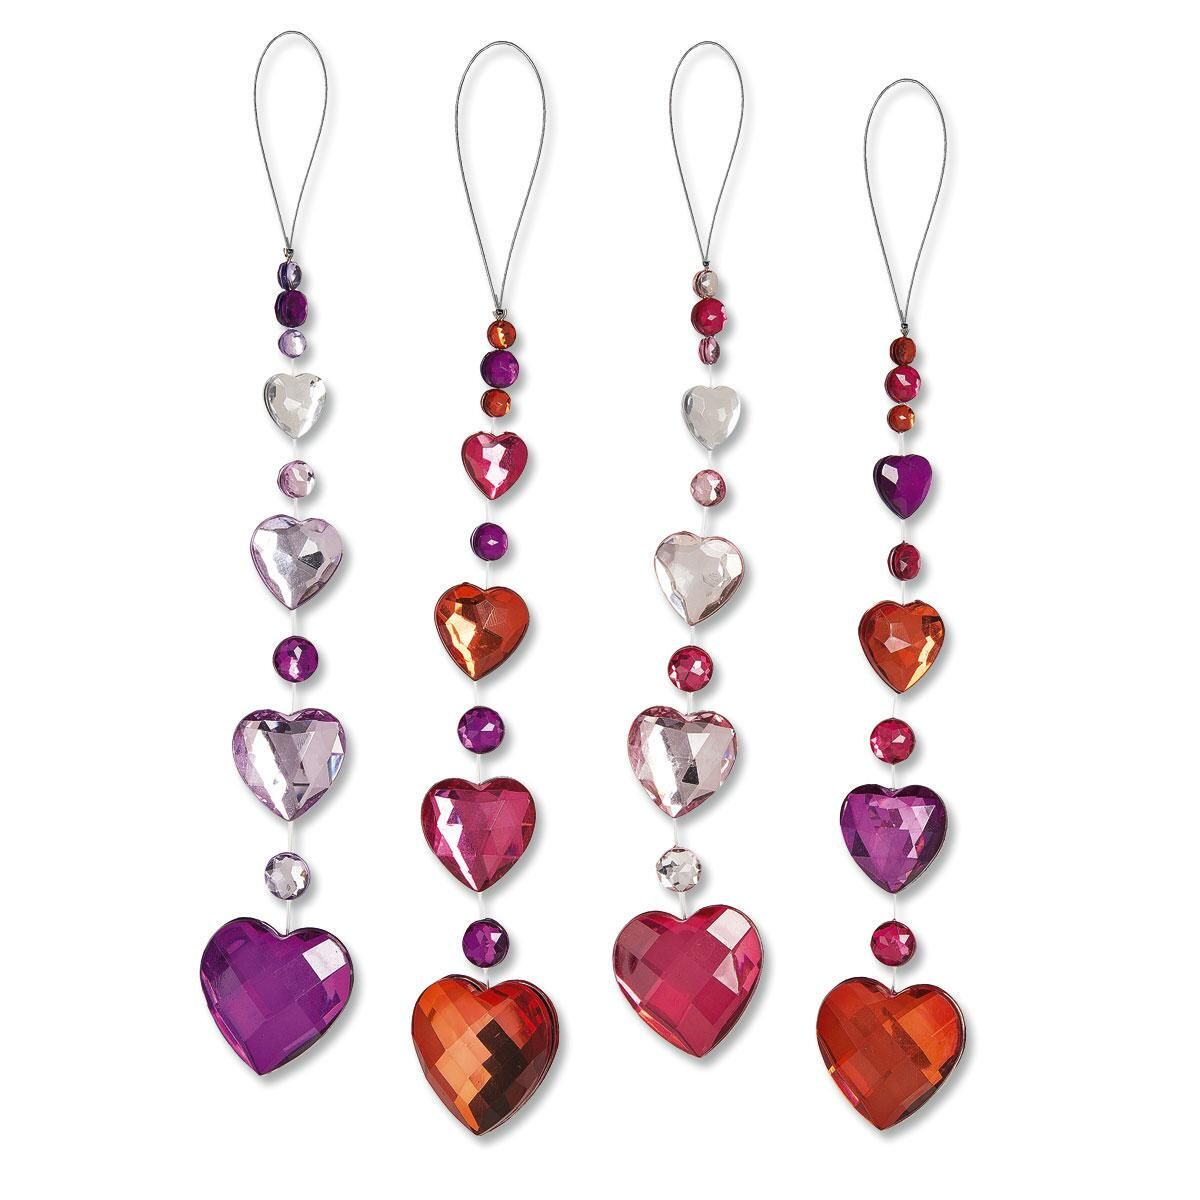 Cascading Hearts Ornament